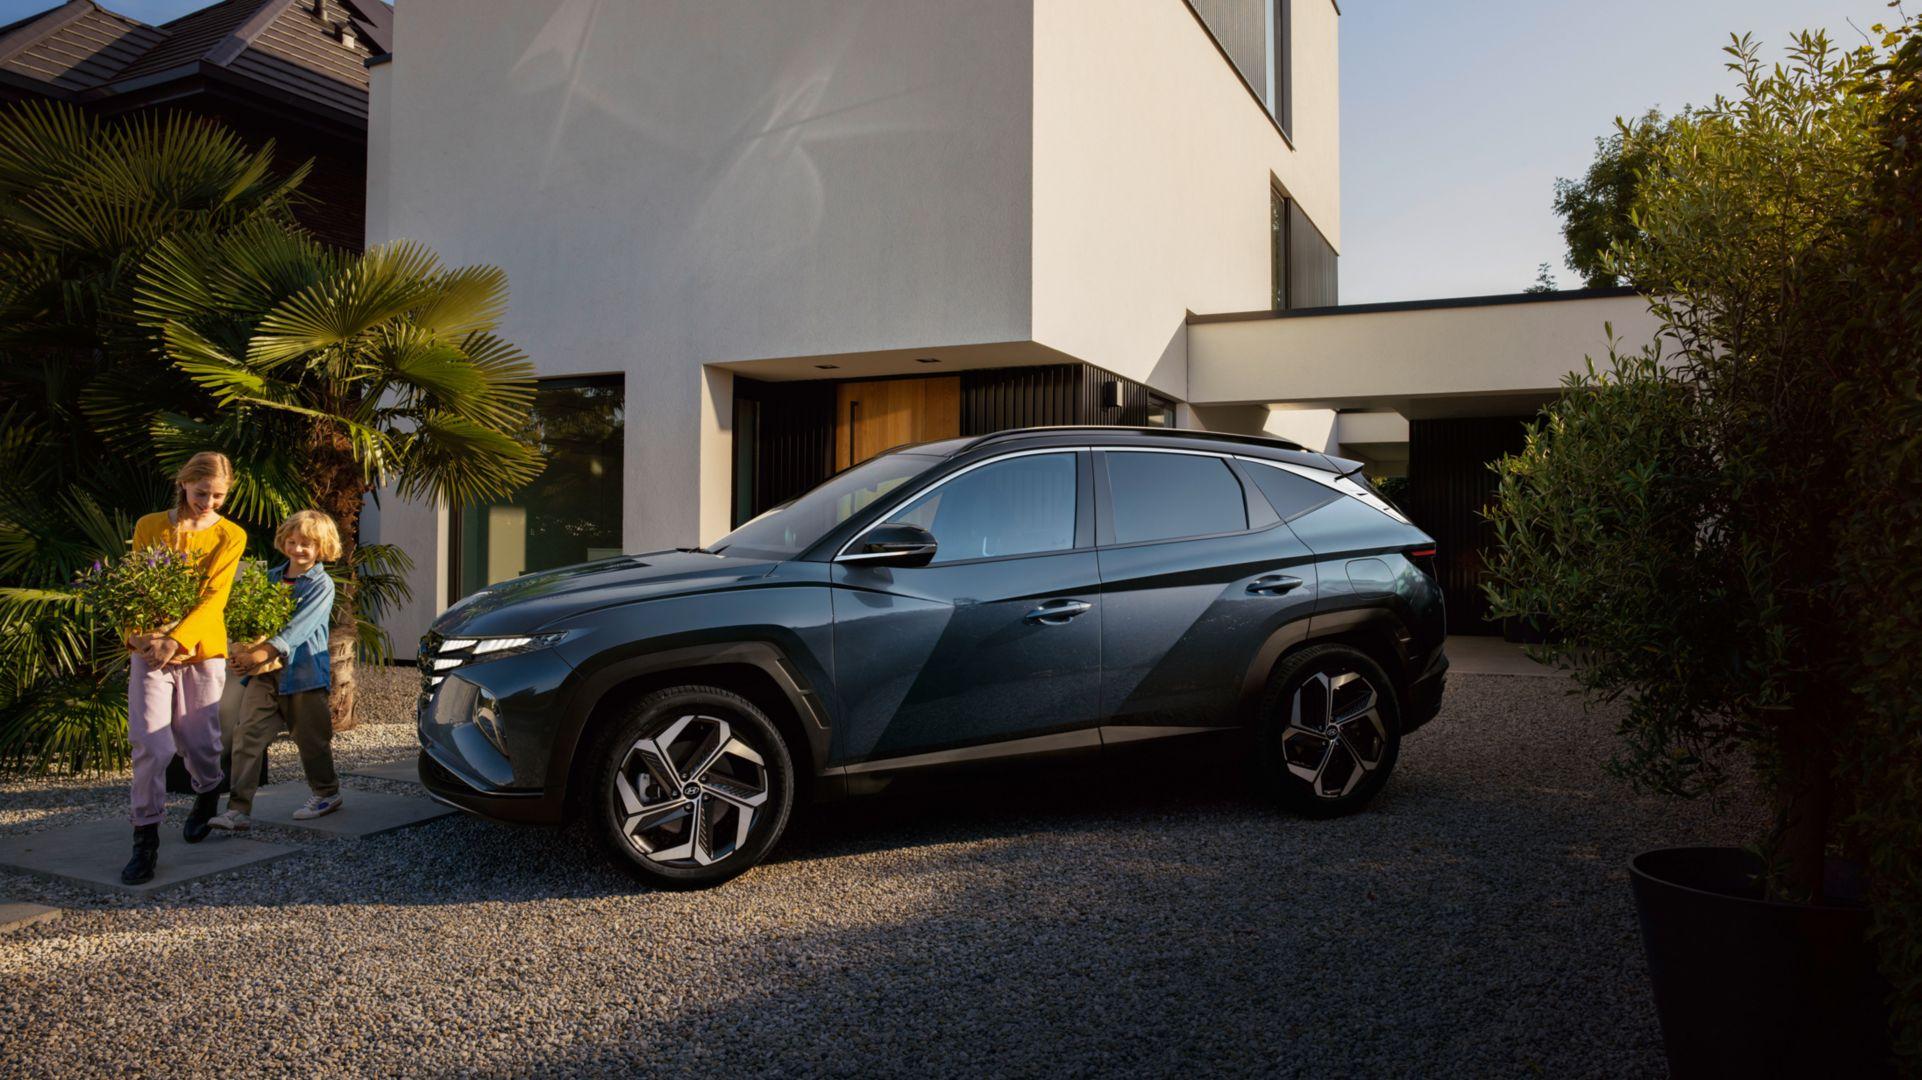 Nuova Hyundai tucson hybrid - Pollina auto